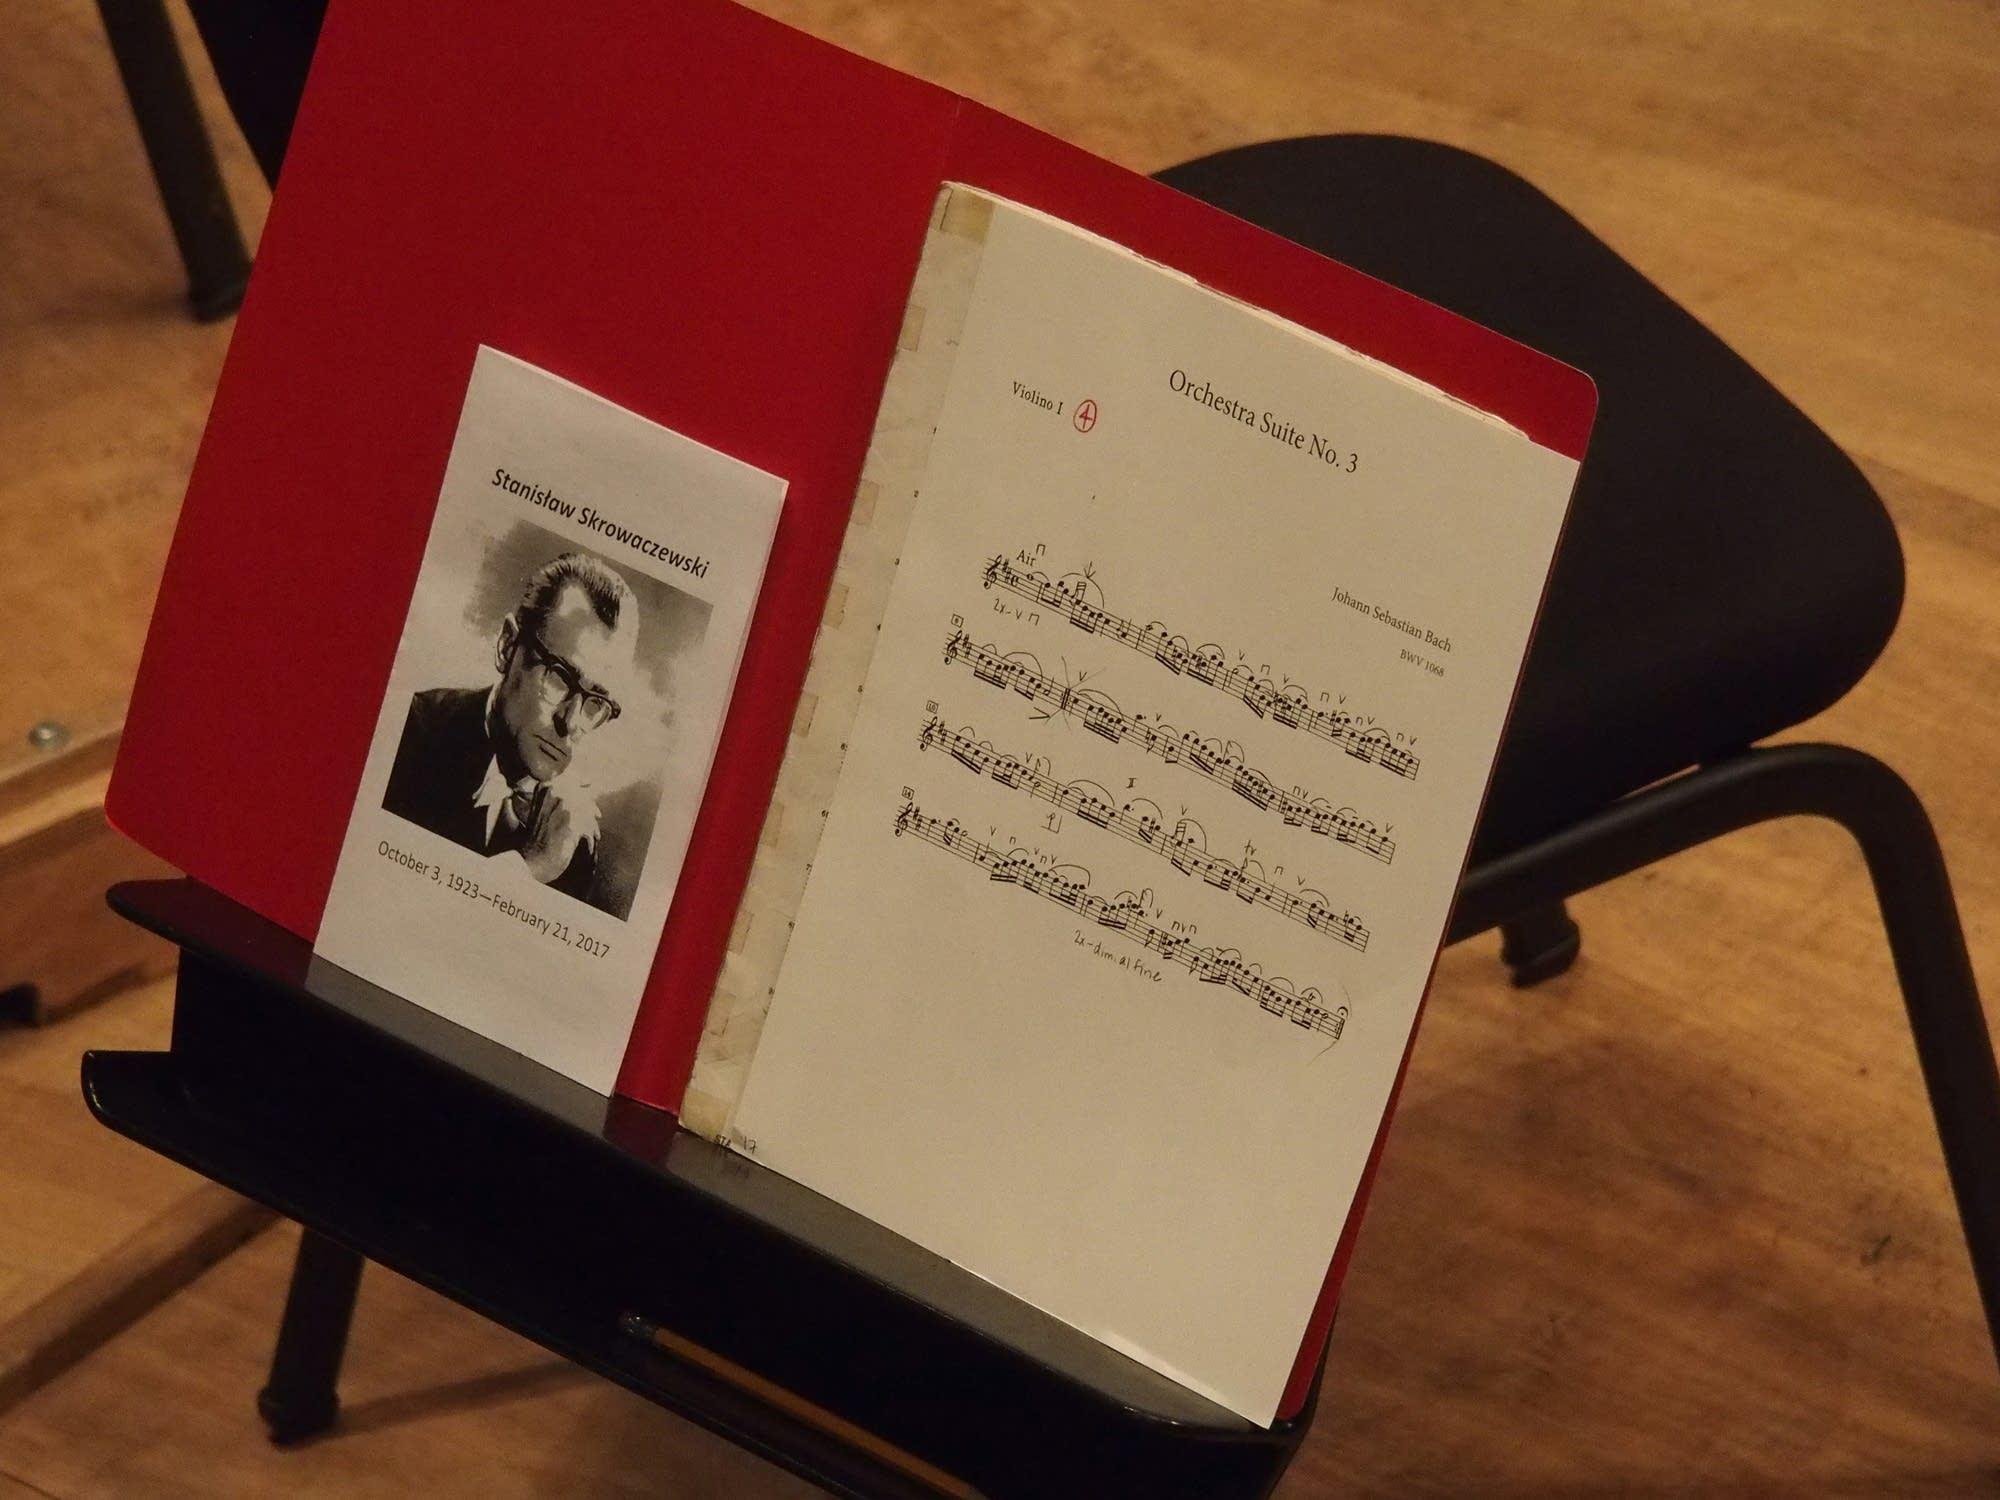 The Stanislaw Skrowaczewski memorial concert program